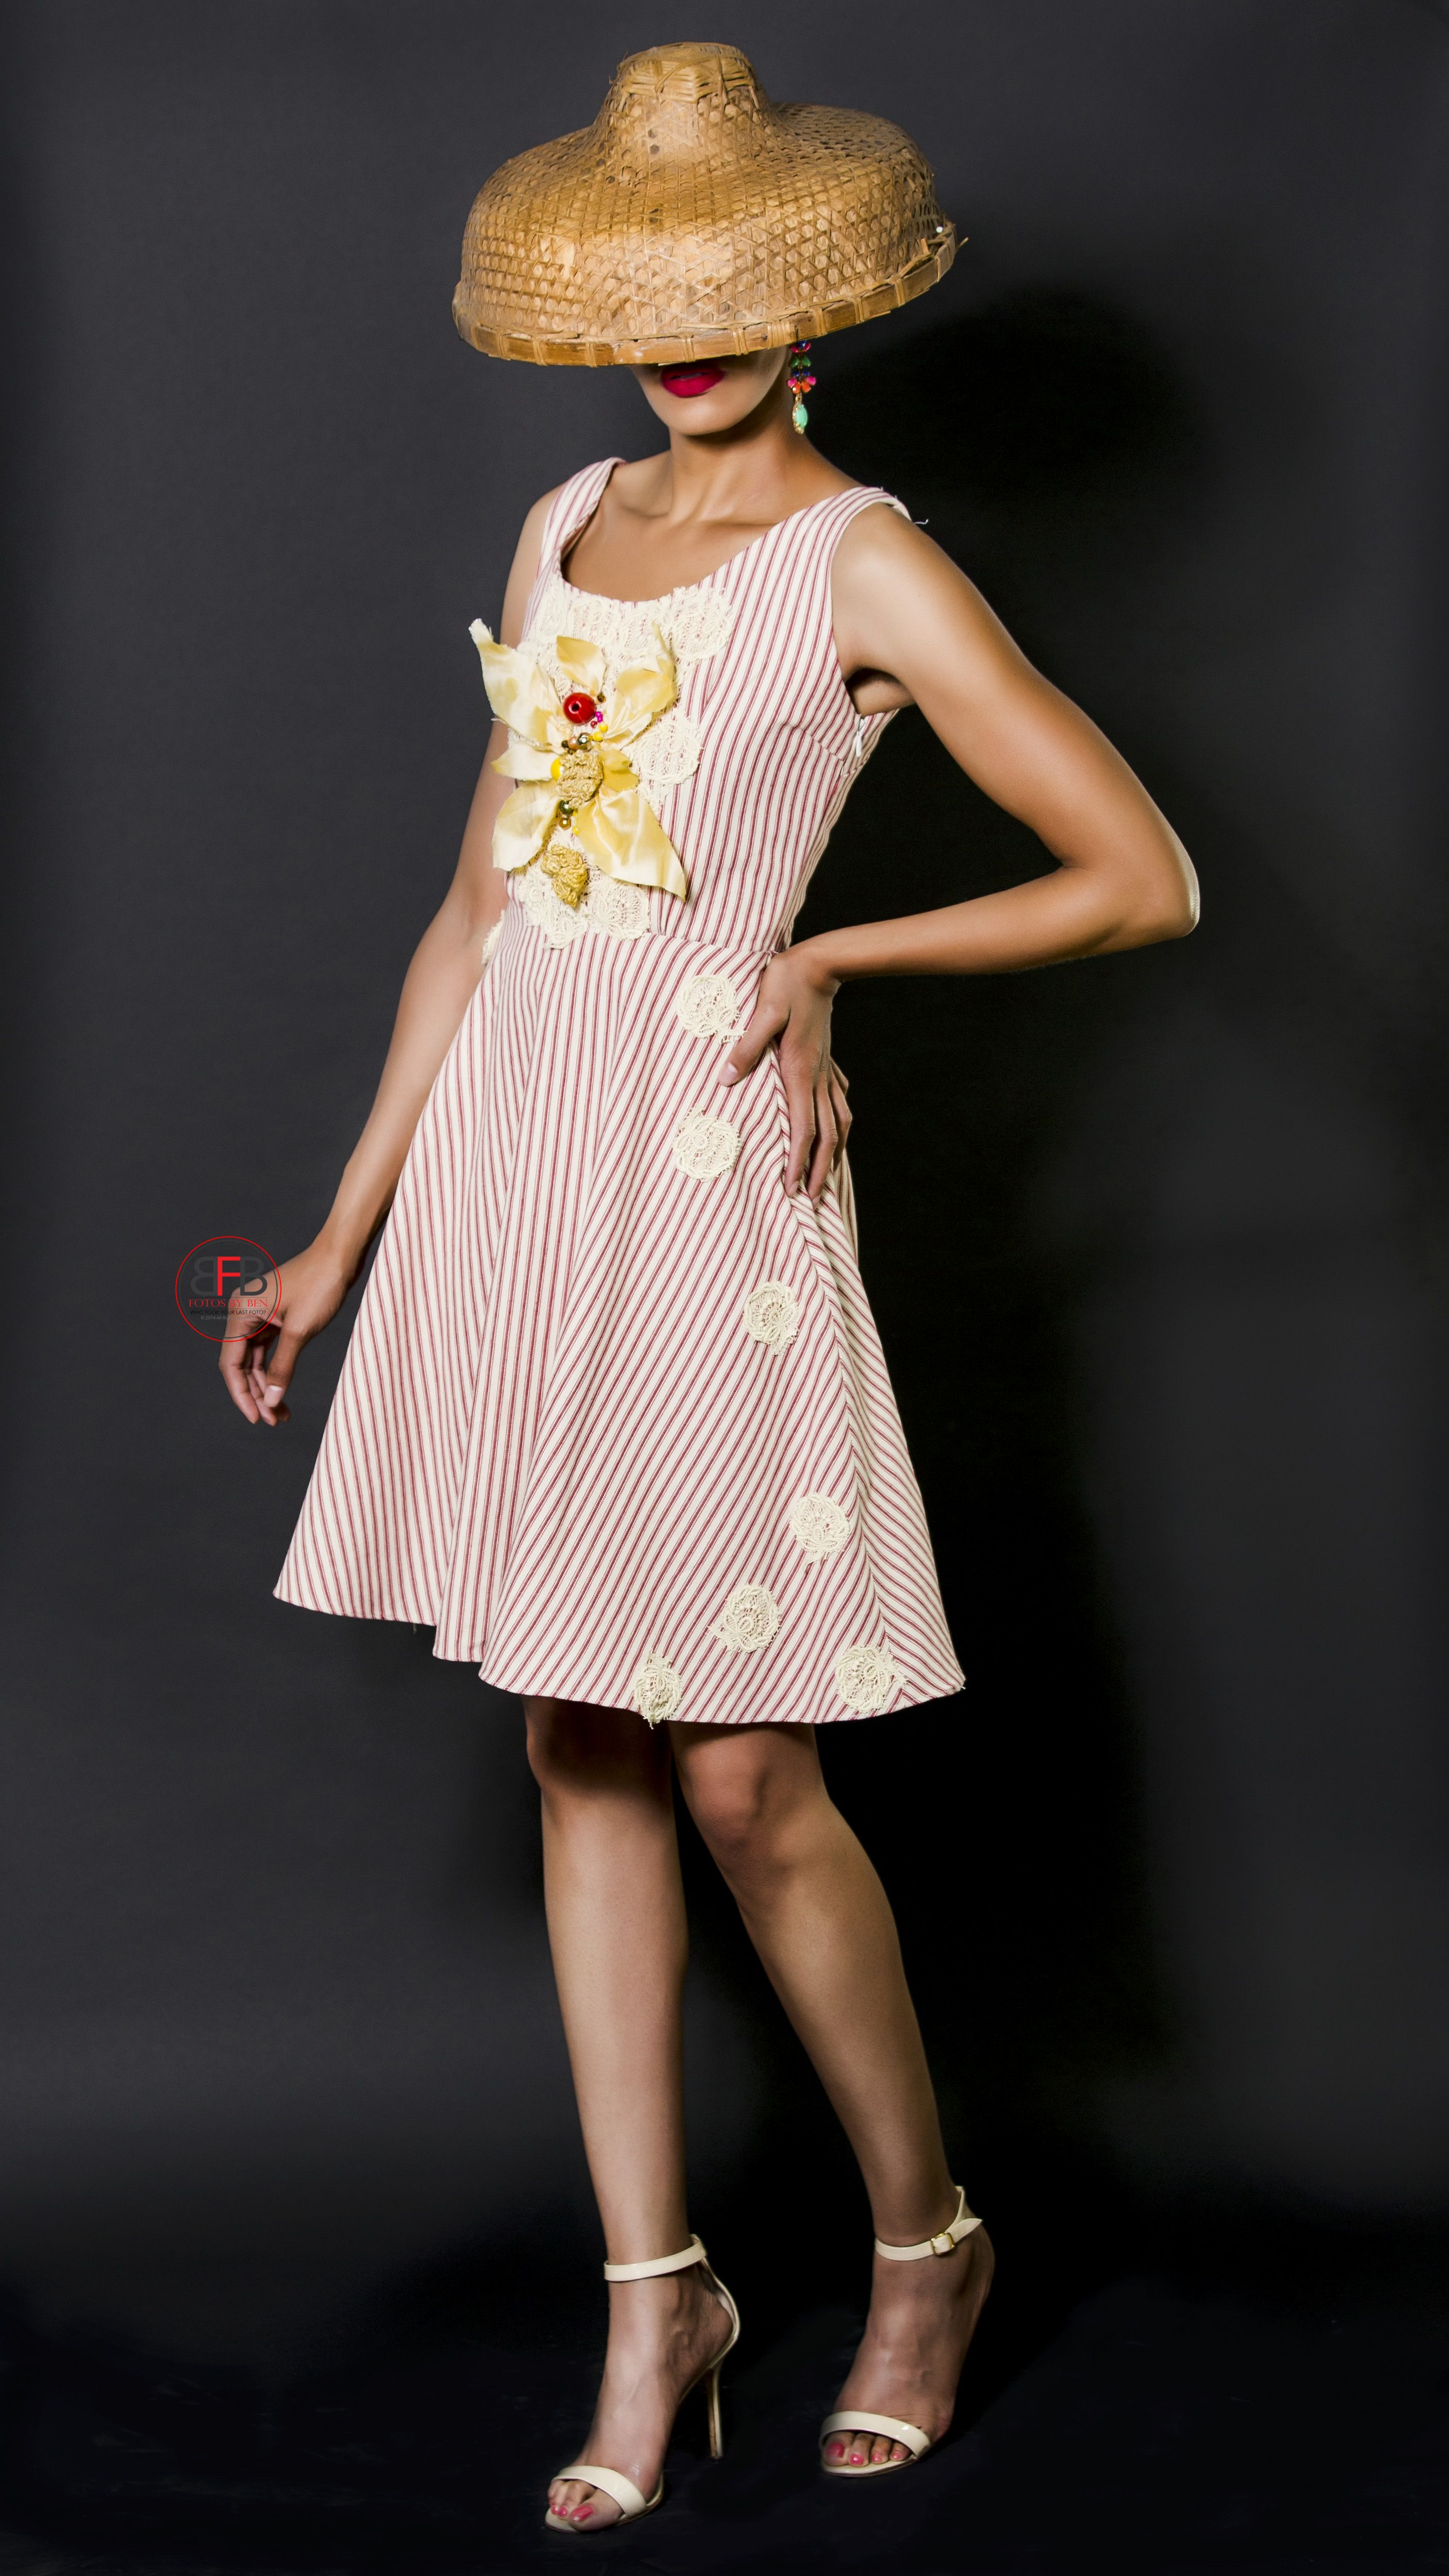 Ava Drake - Carla-2464-2 Candy striped cotton summer dress 2